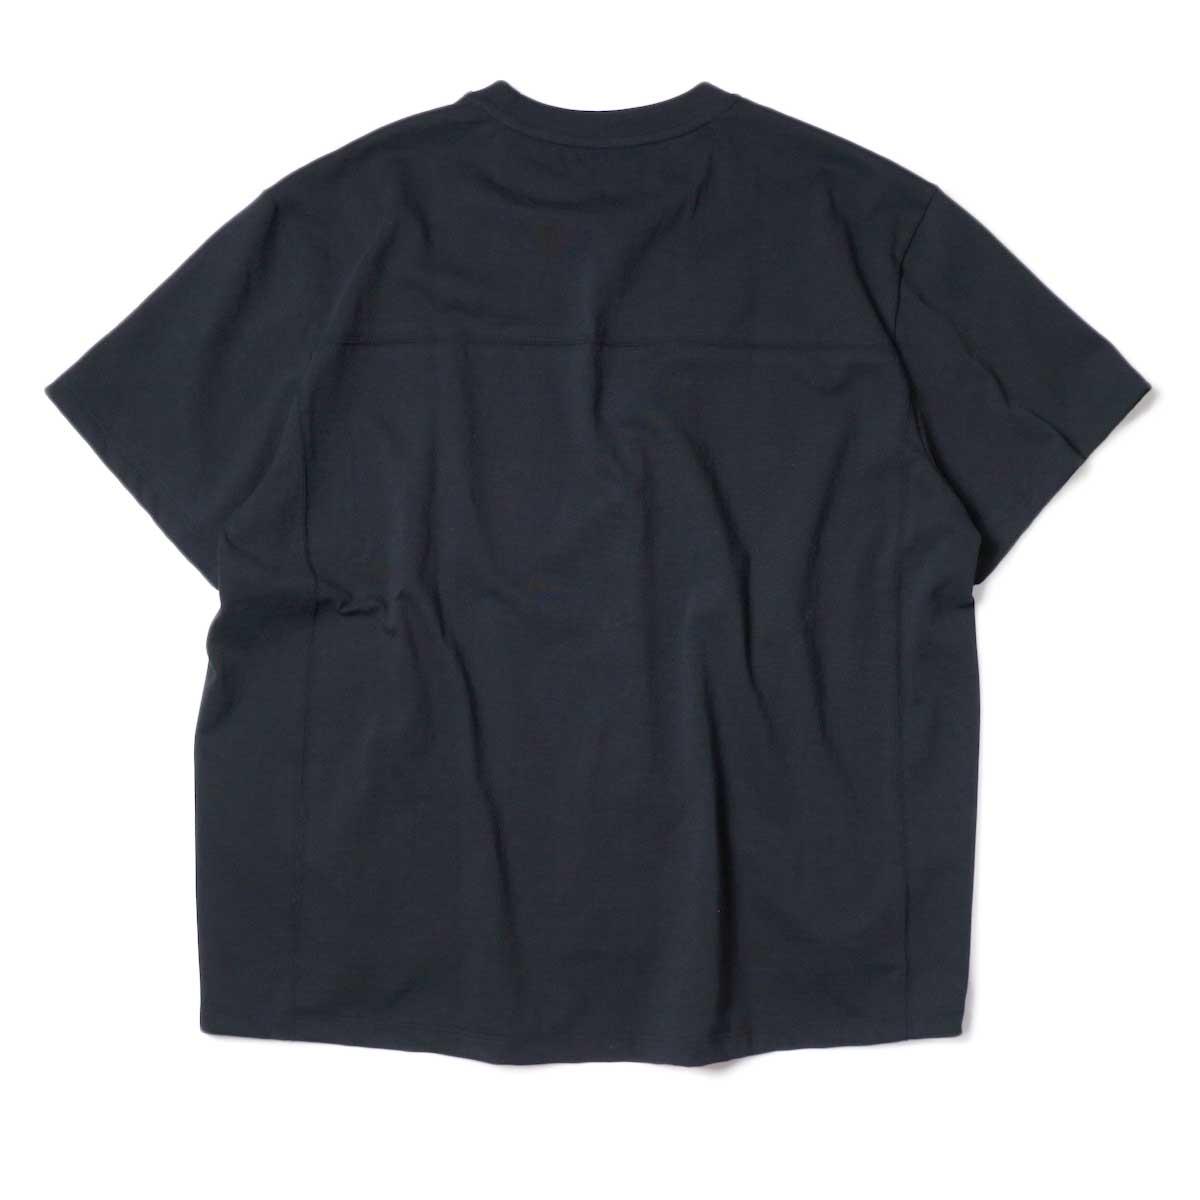 alvana / Protect Football S/S Tee (Black)背面